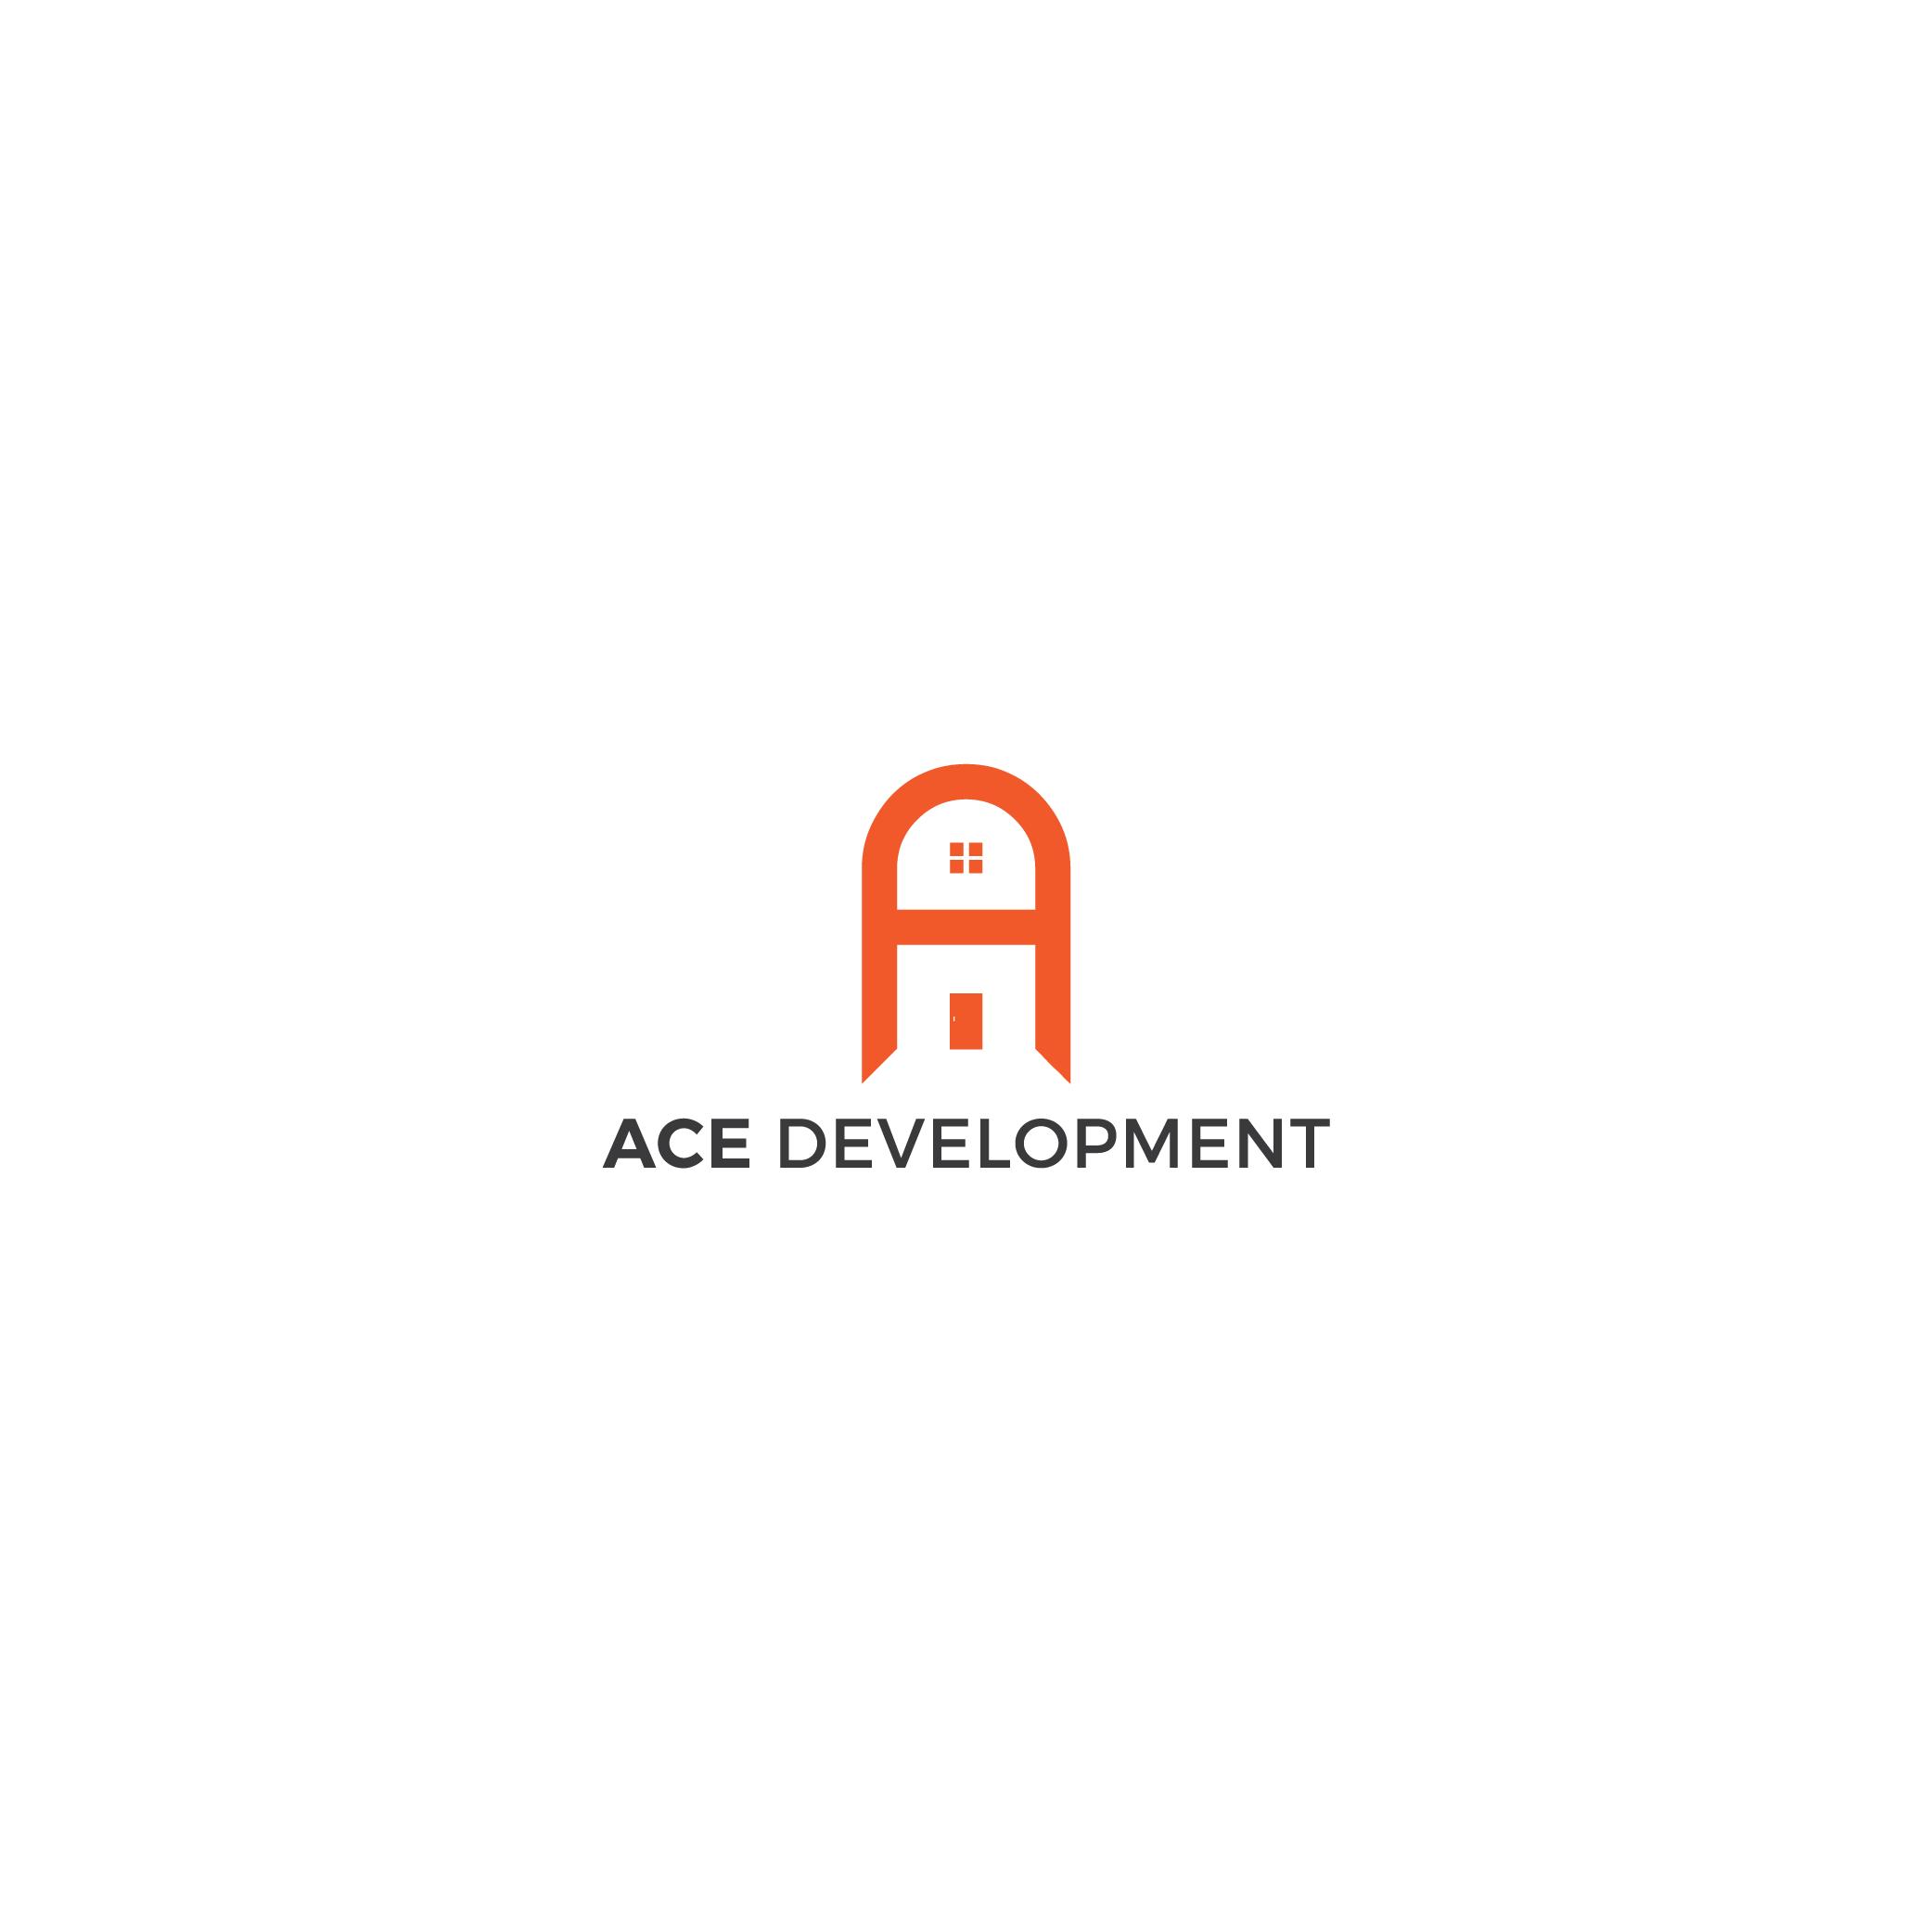 Logo Design by 354studio - Entry No. 50 in the Logo Design Contest Fun Logo Design for Ace development.